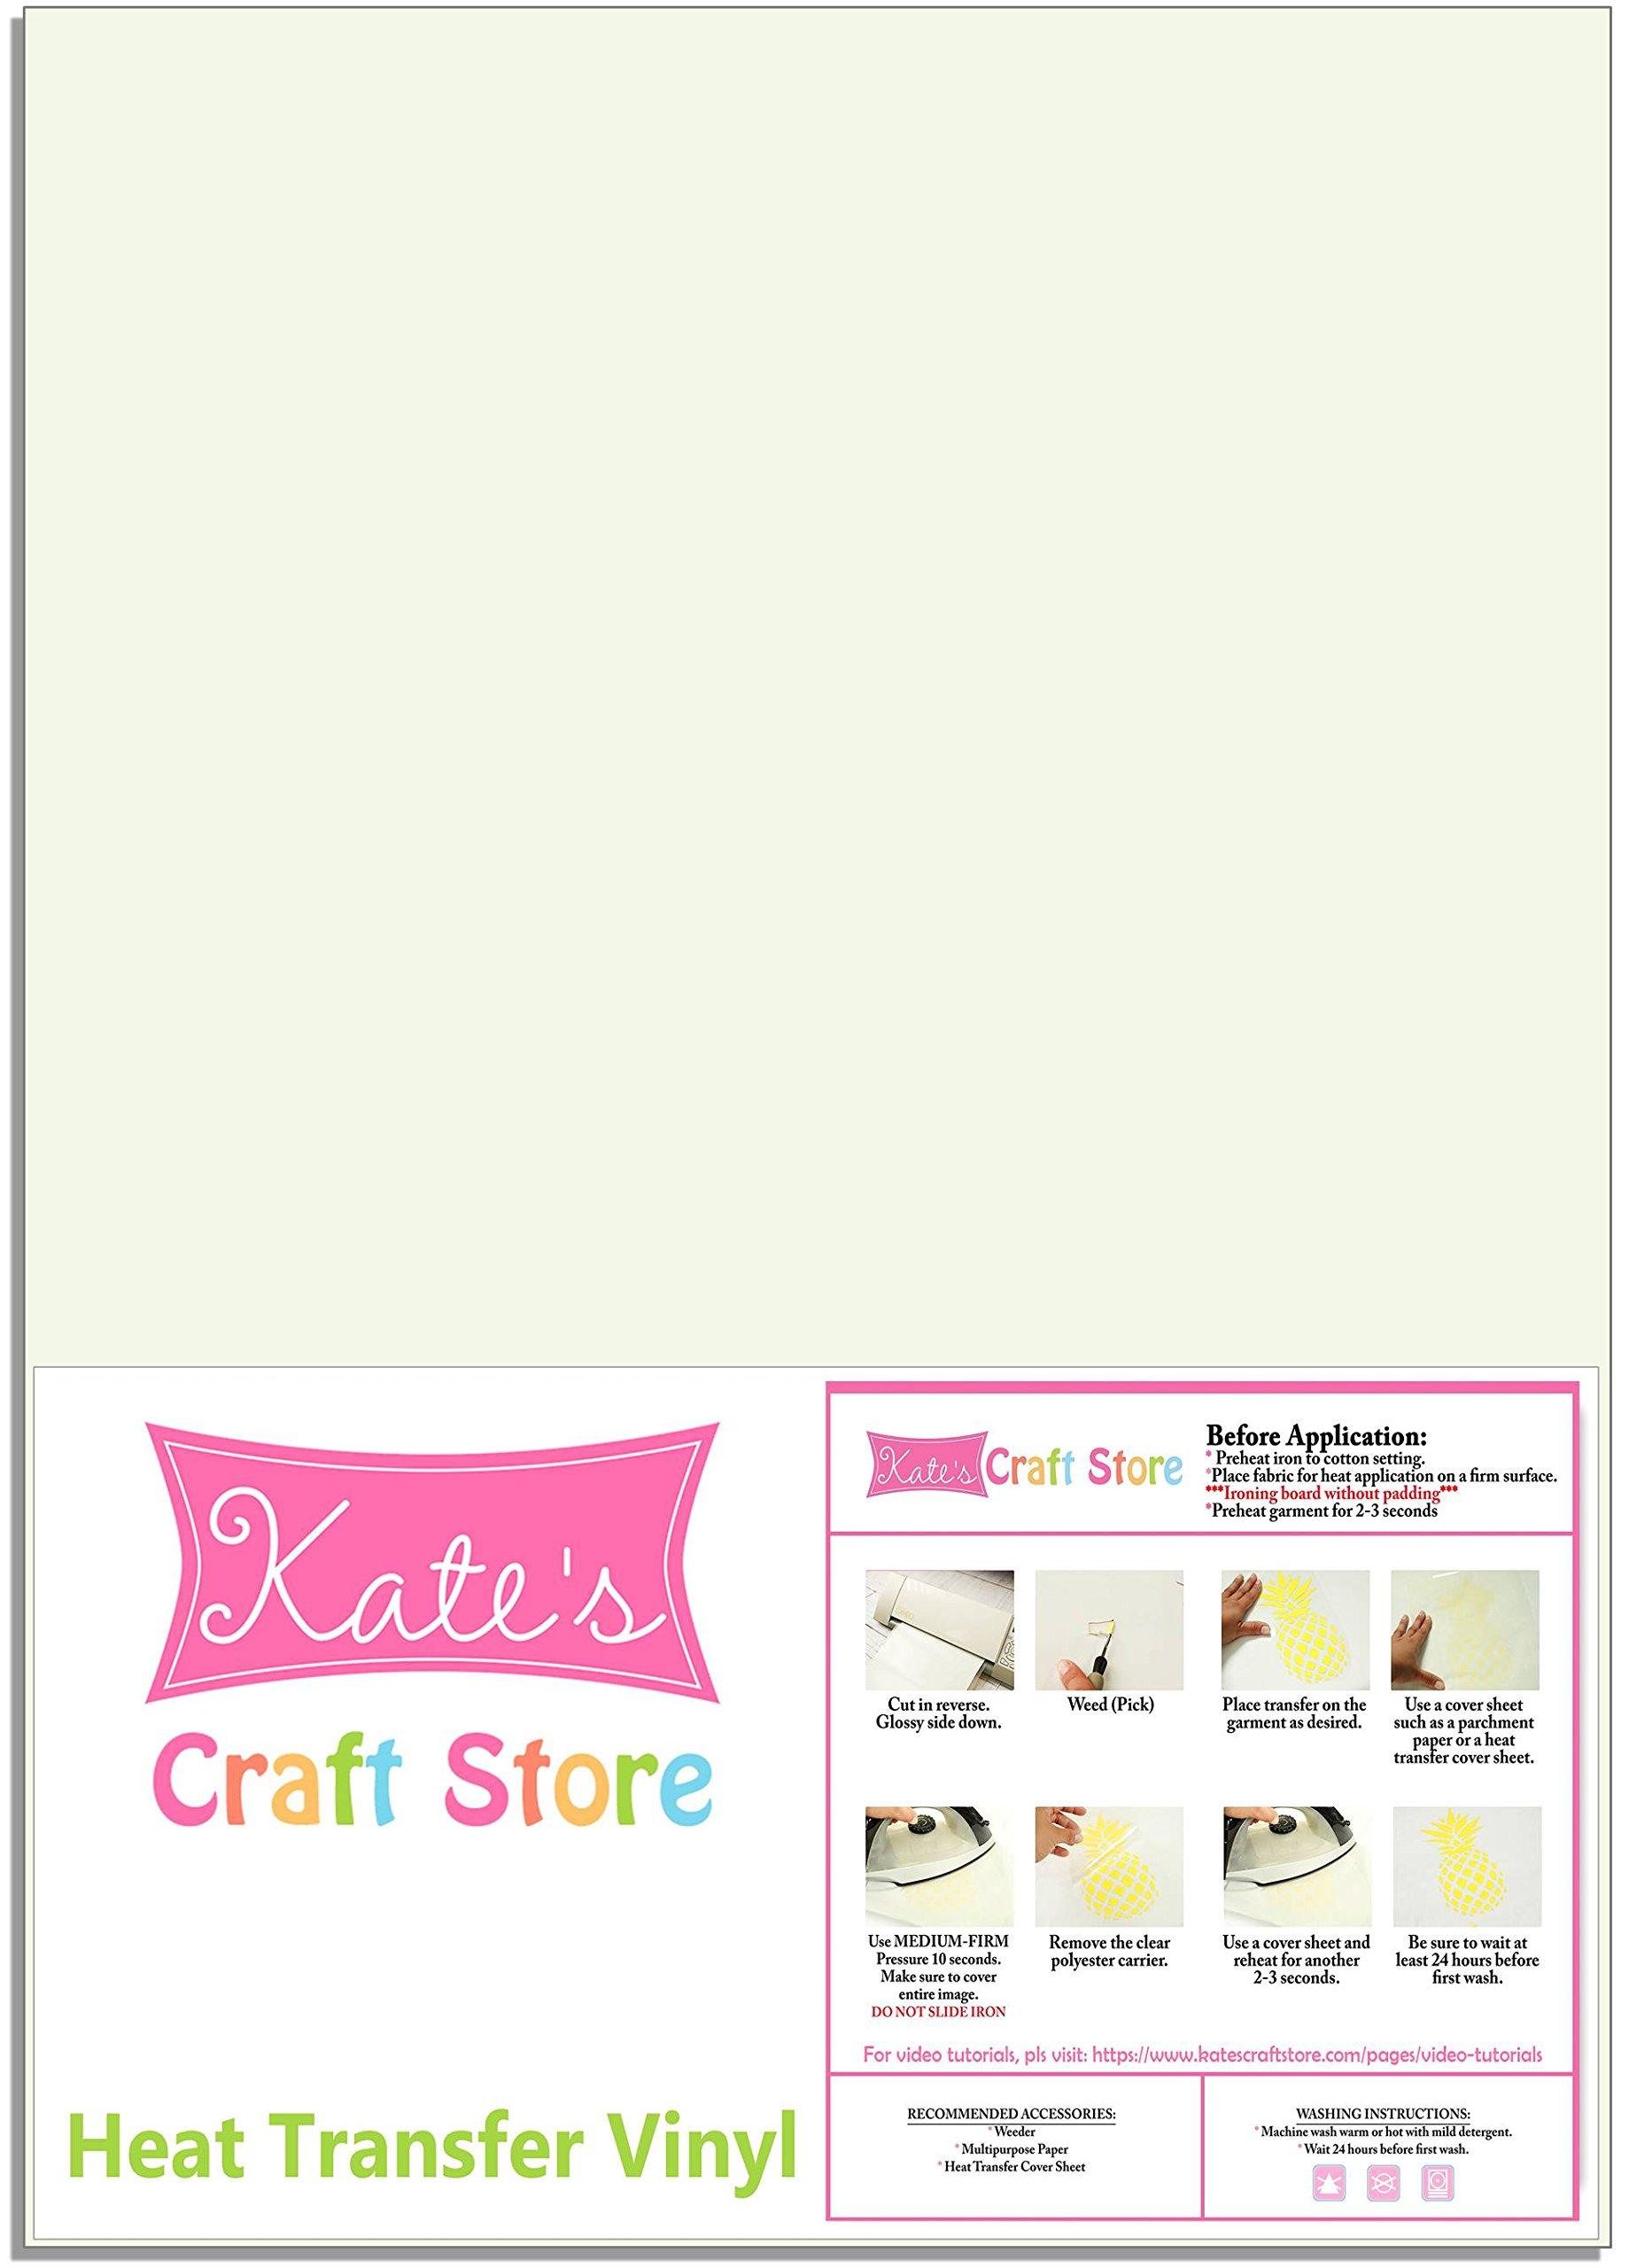 Kate's Craft Store - 12'' x 15'' Siser Easyweed T-Shirt Iron-on Heat Transfer Vinyl Sheet - GLOW IN THE DARK